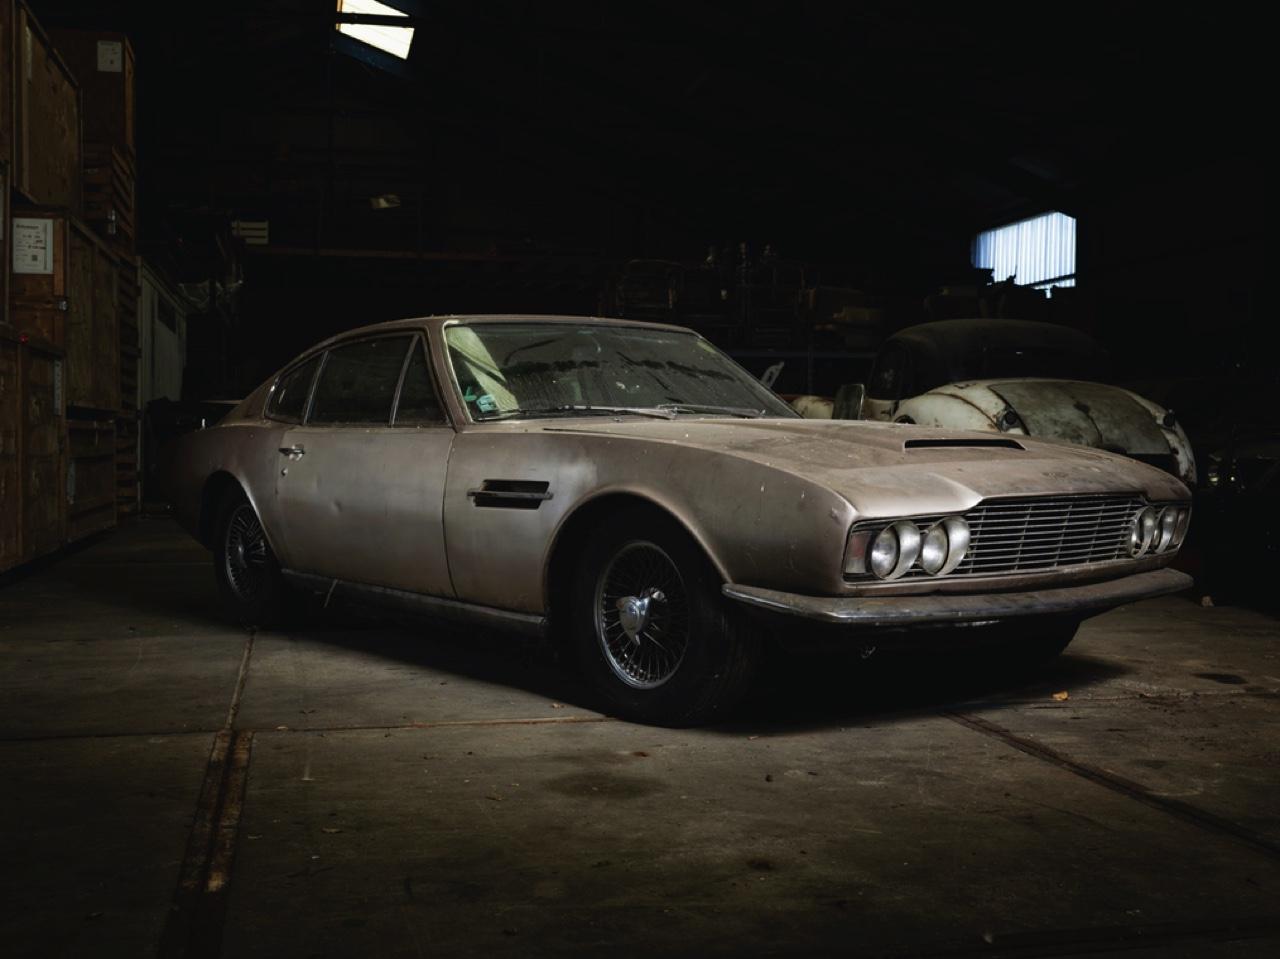 Aston Martin DBS Silverstone Auctions -10- Autovisie.nl